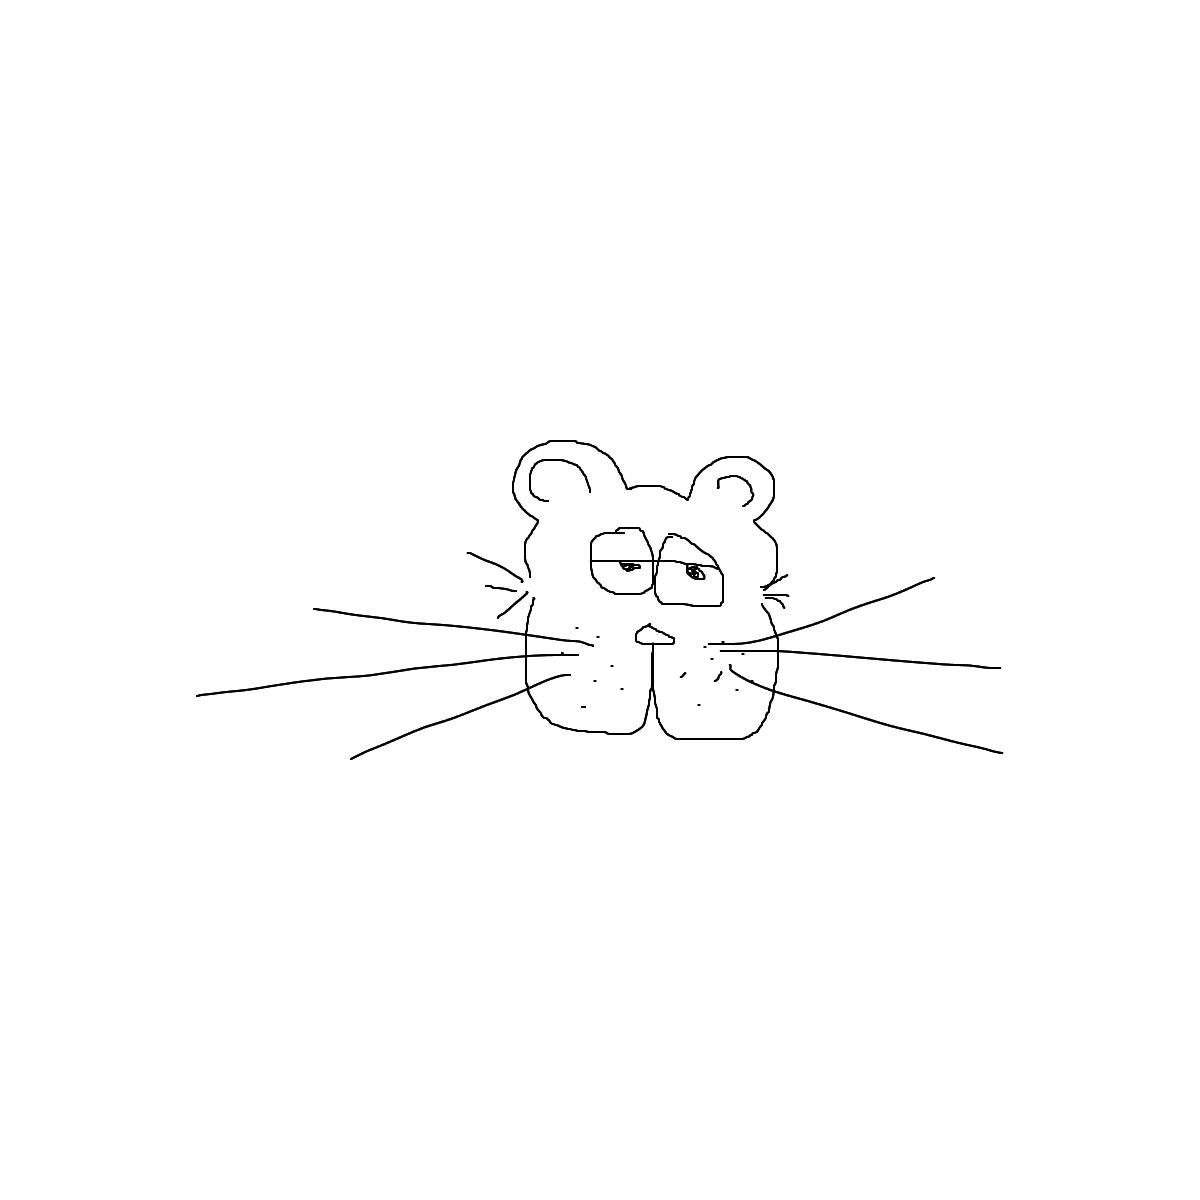 BAAAM drawing#18773 lat:49.2433547973632800lng: -123.2230453491211000